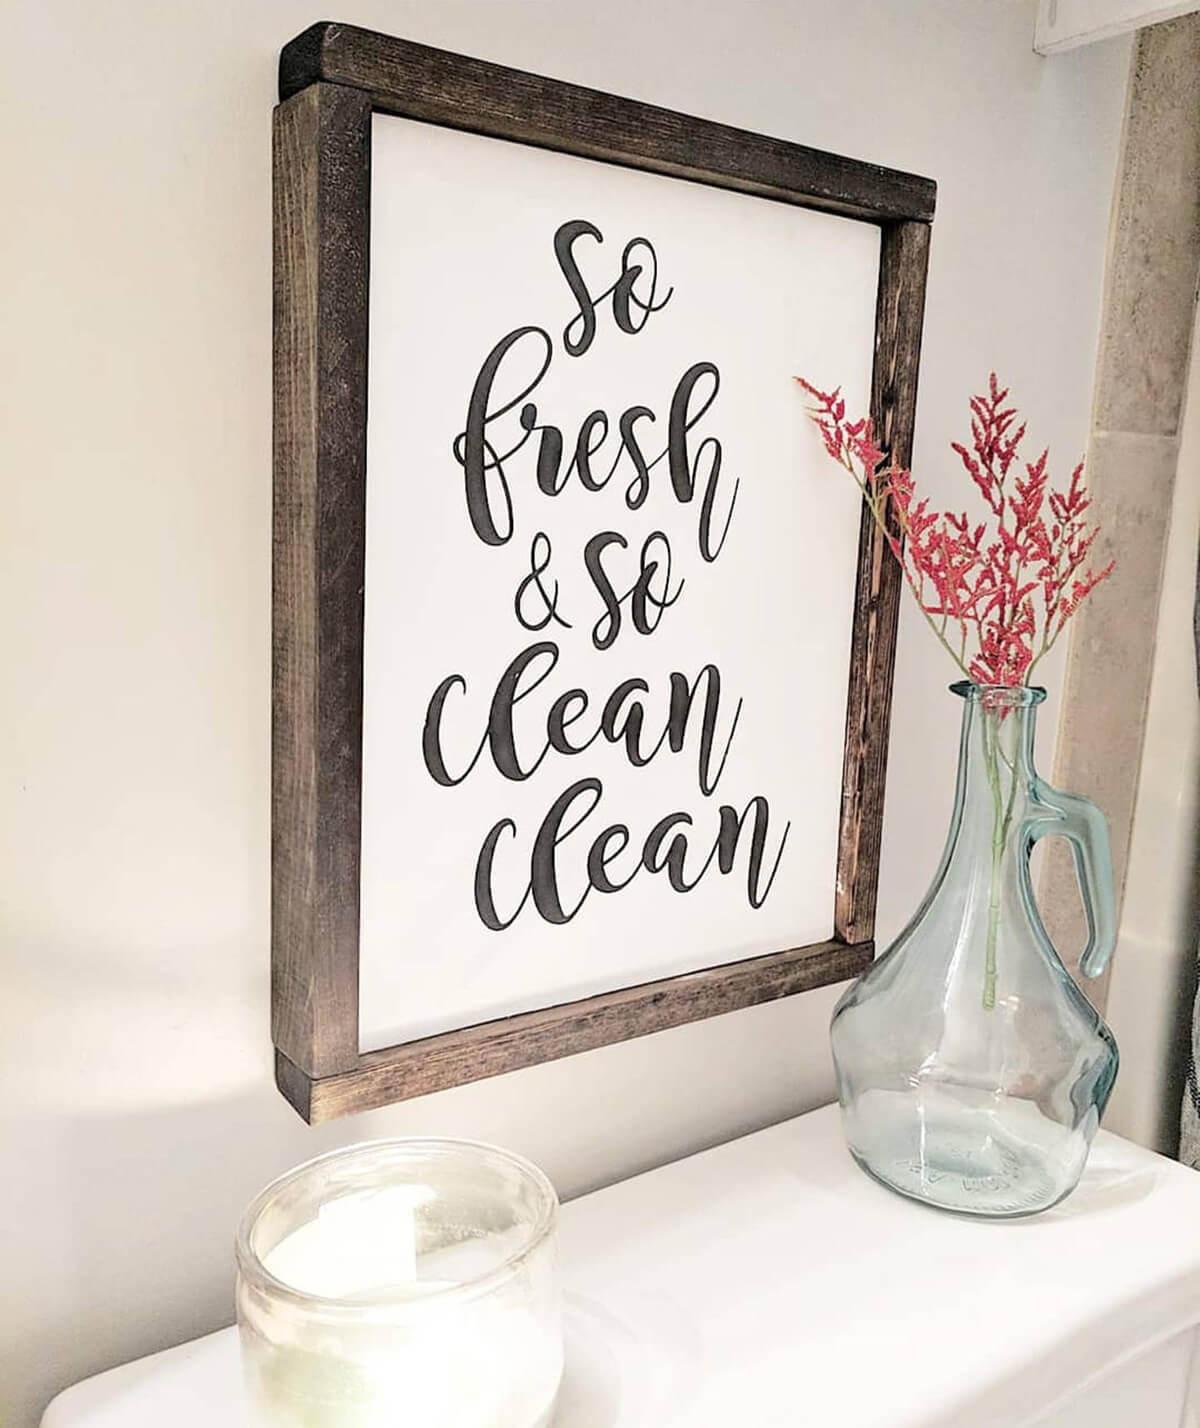 Clean bathroom sign